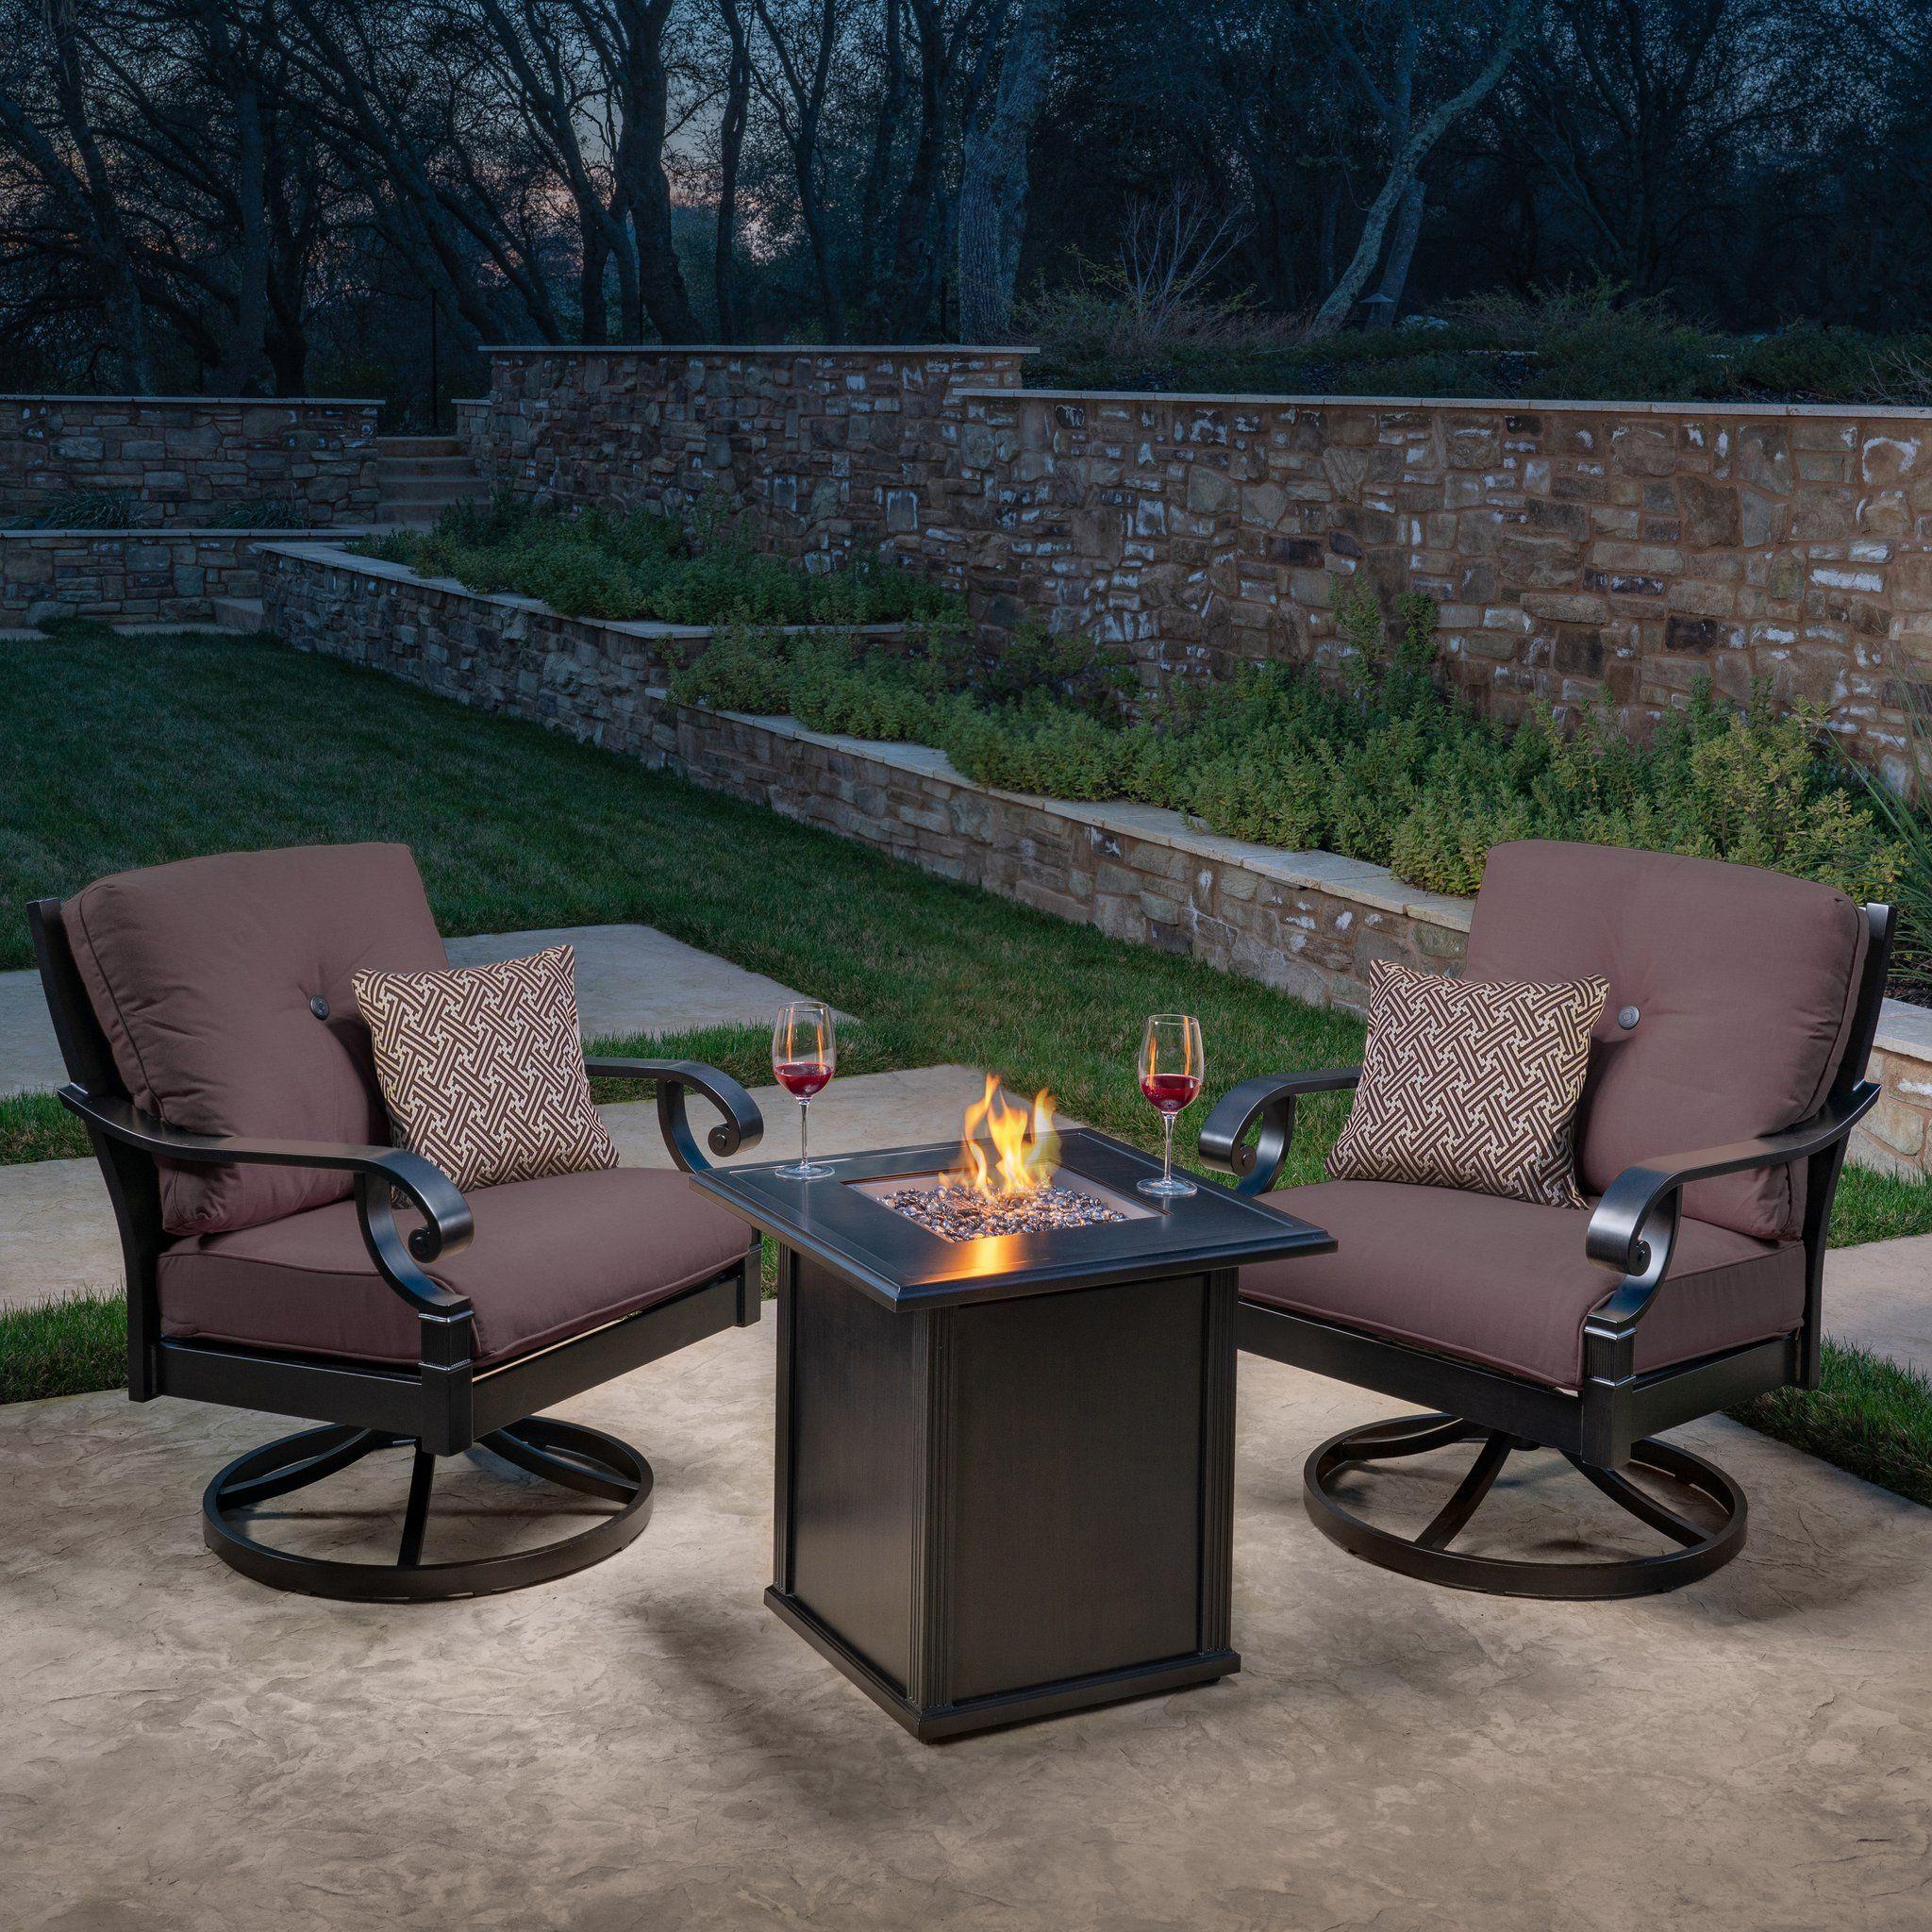 Verena 3 Piece Fire Chat Set Teak Patio Furniture Patio Outdoor Decor